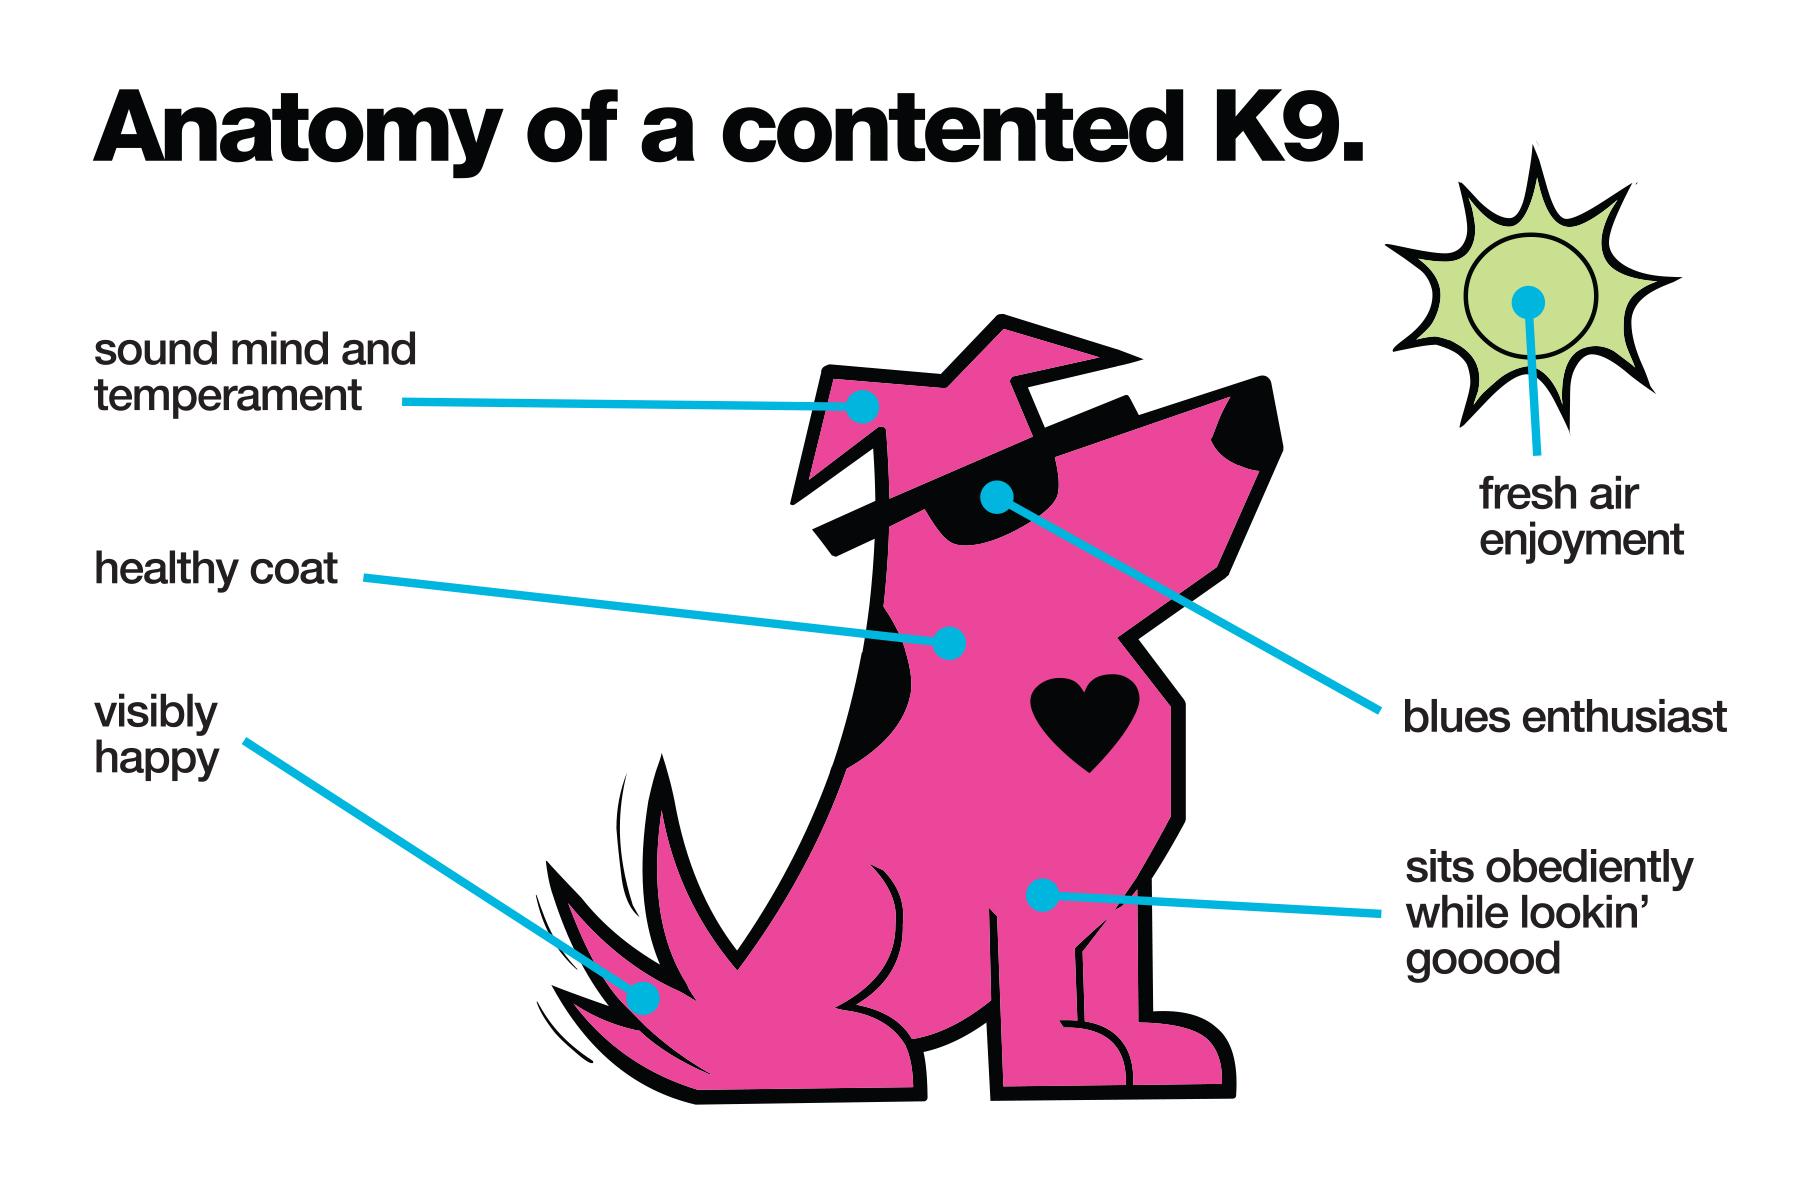 Anatomy_contented_k9_title.jpg